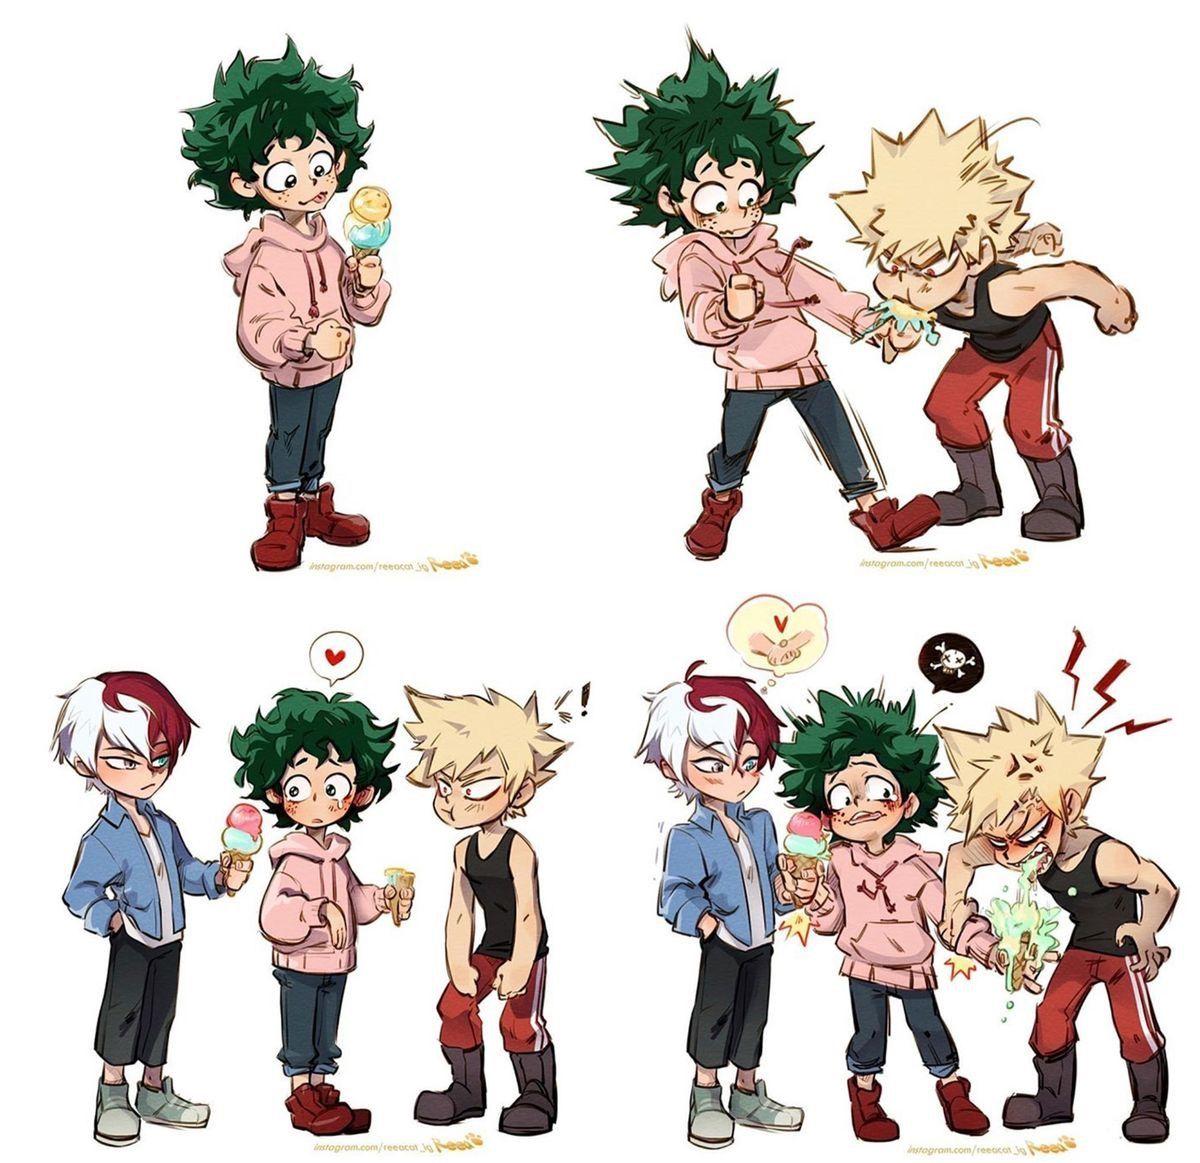 This Is Cute But A Little Gross Lol My Hero Hero My Hero Academia Manga